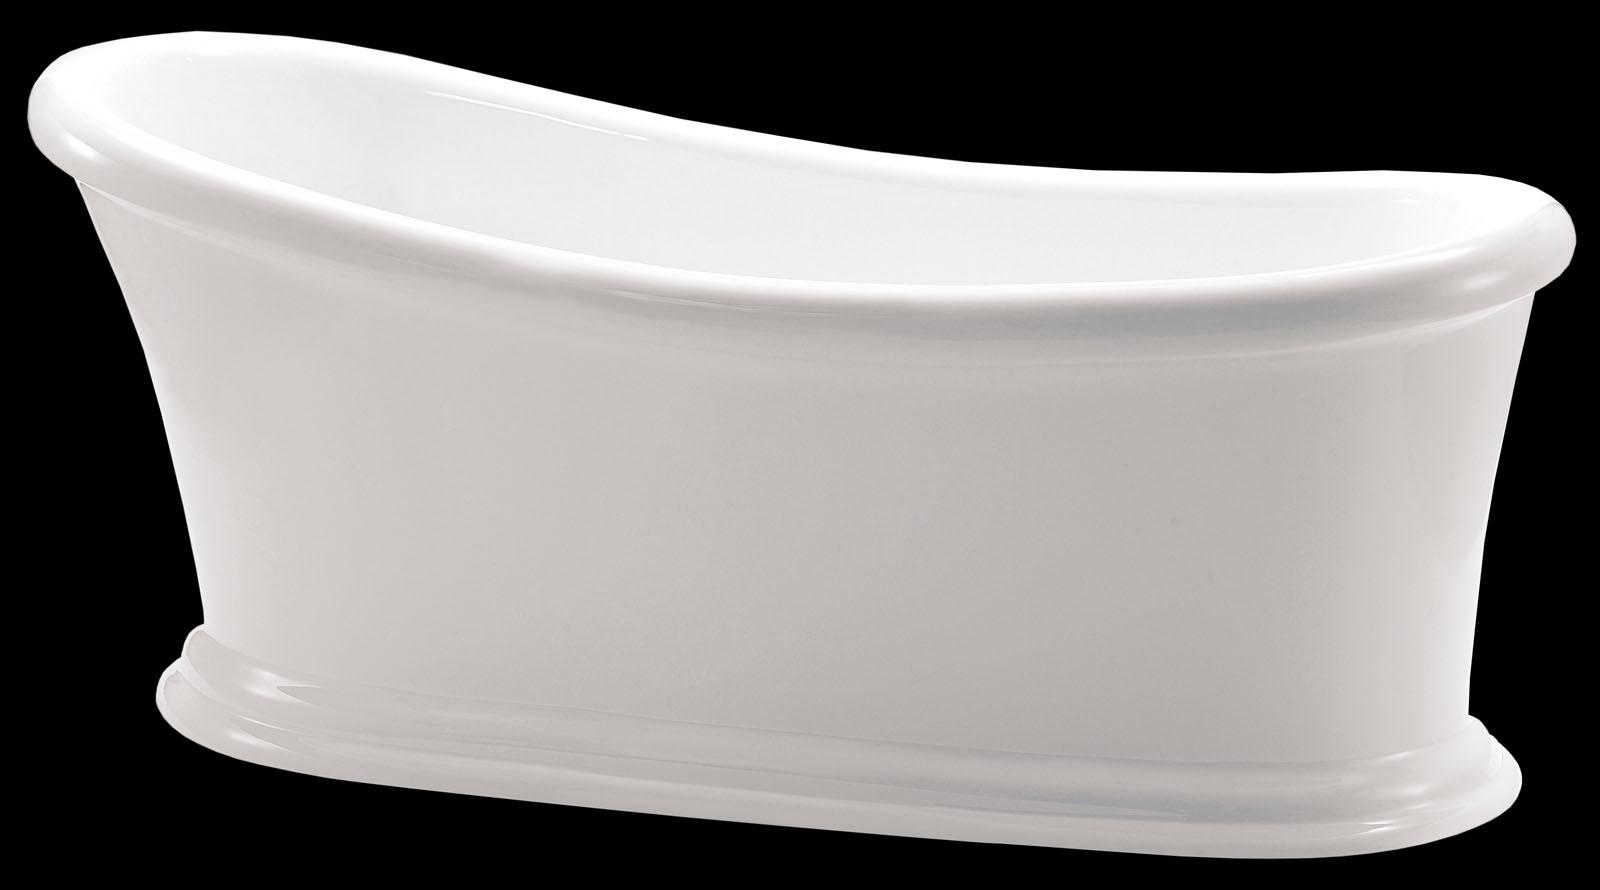 Vasche da bagno piccole dimensioni prezzi perfect trendy vasca da